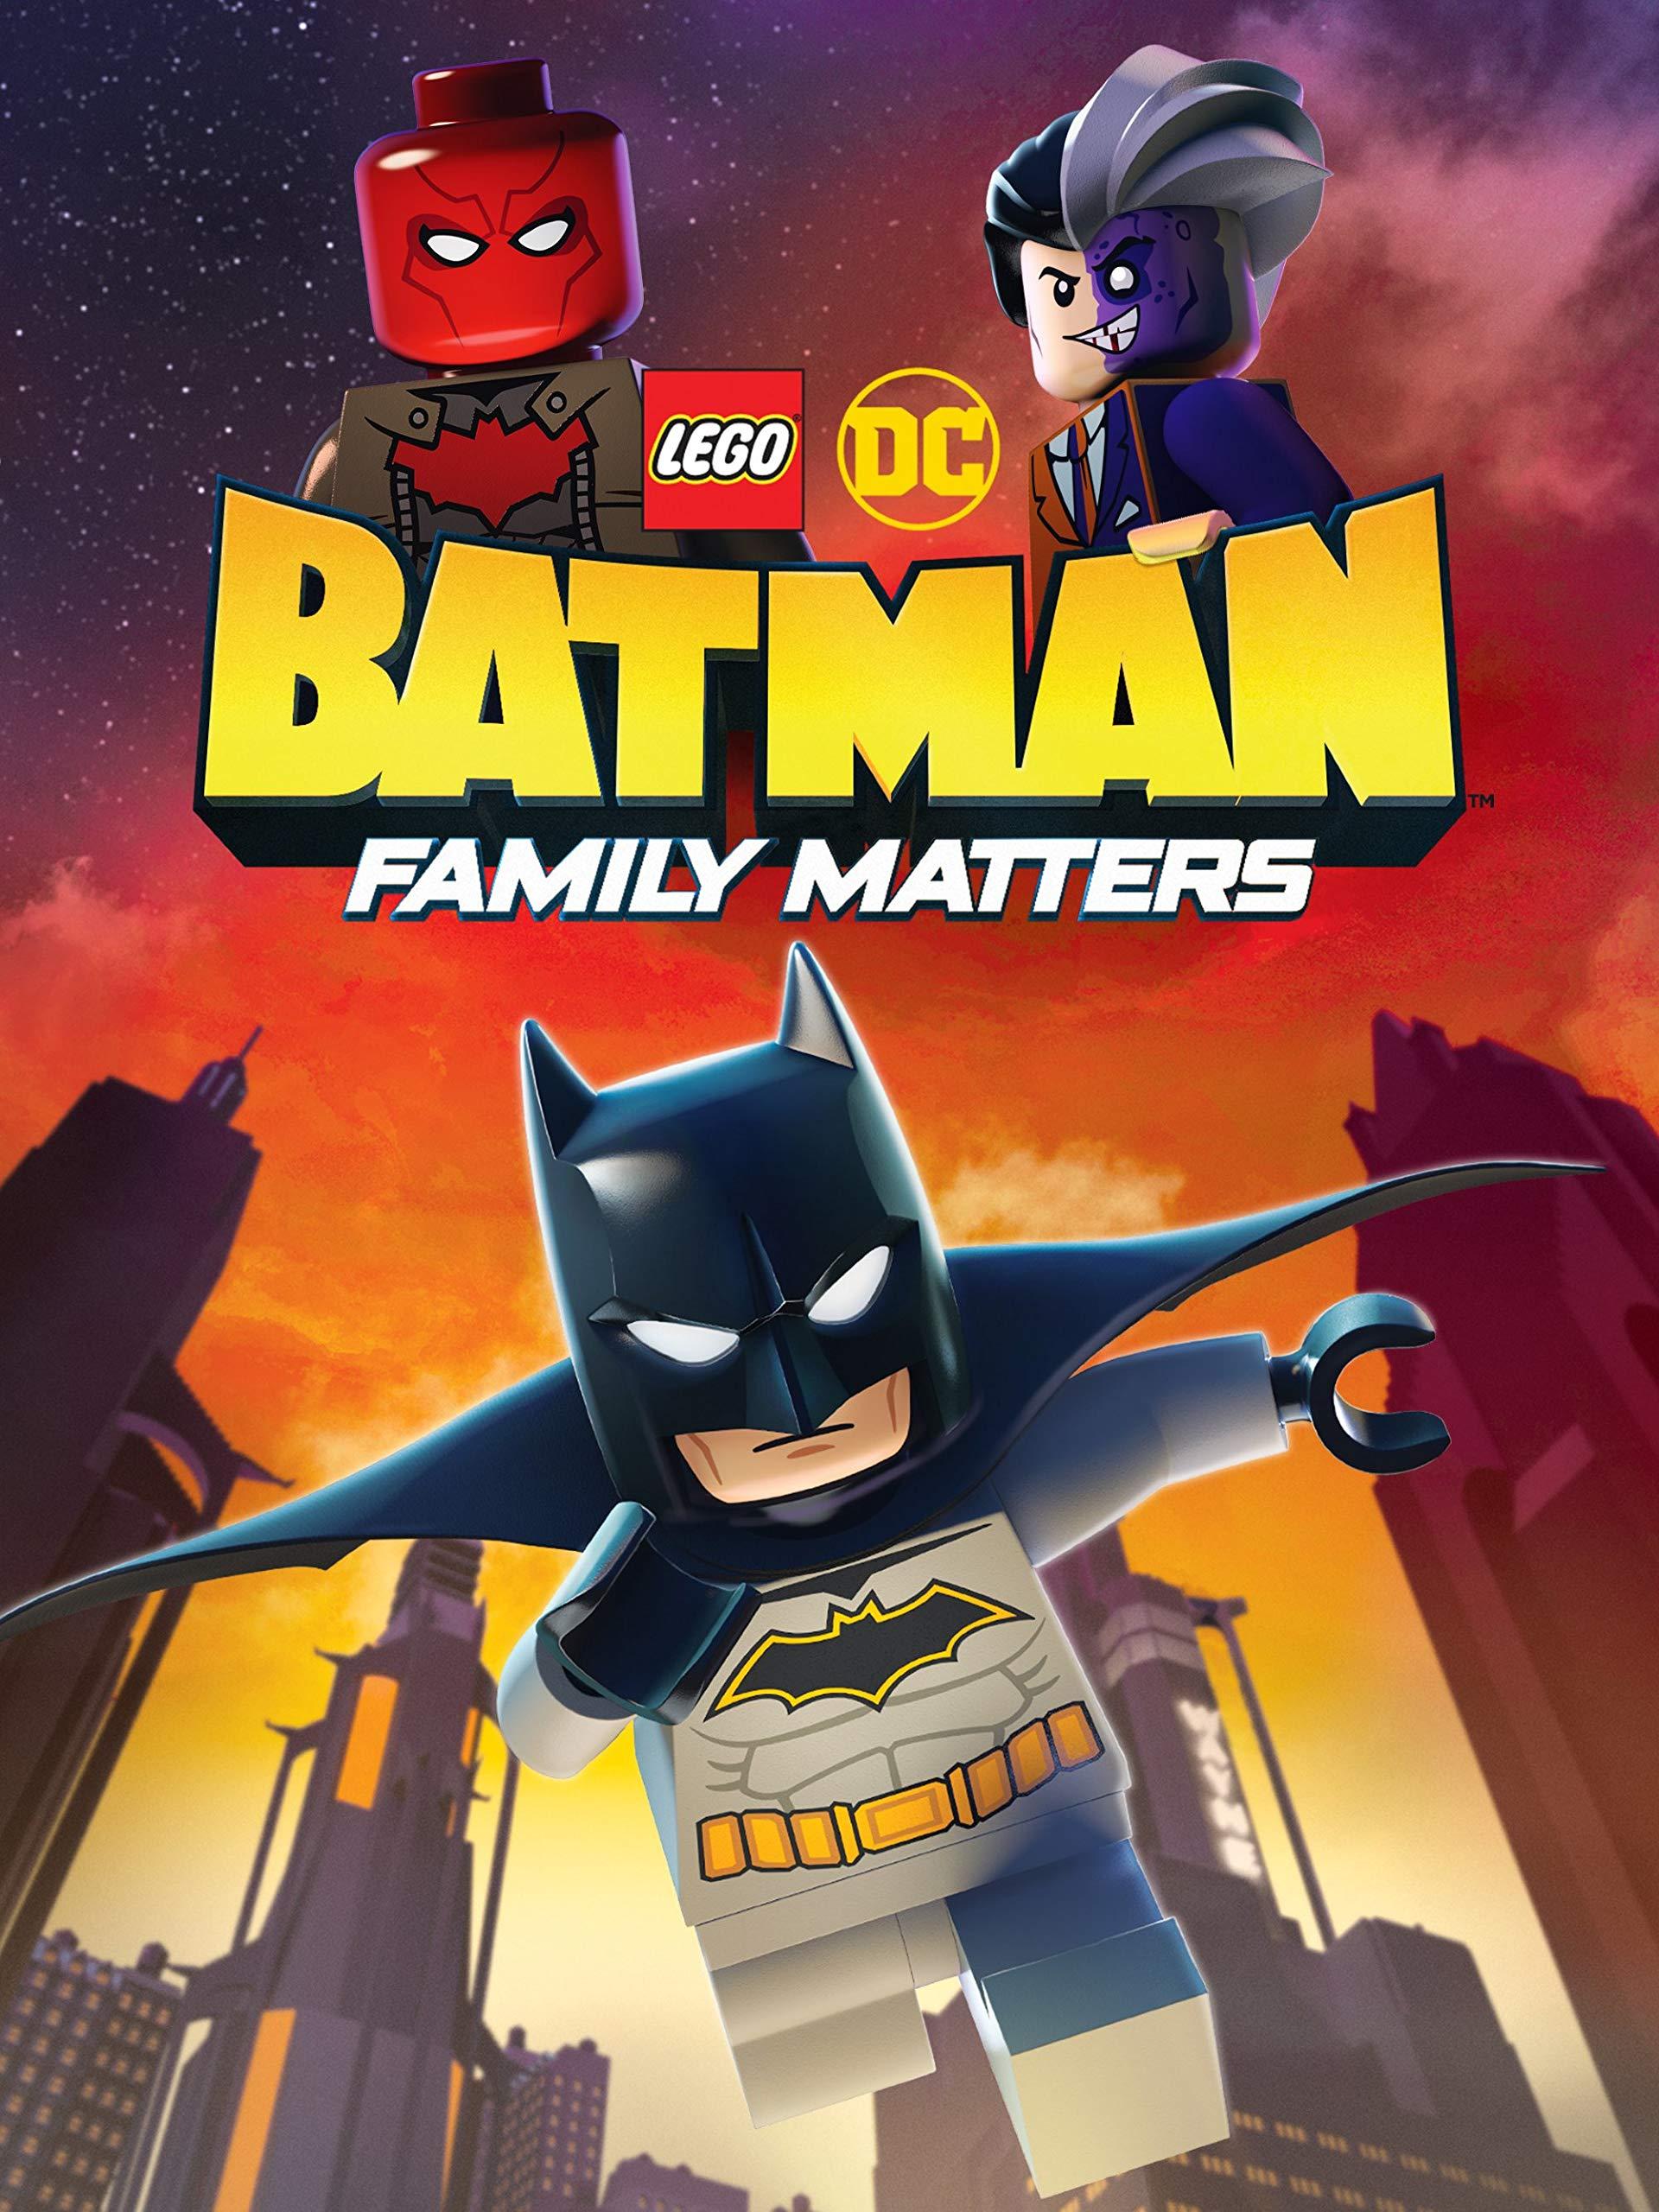 Amazon.com: Watch LEGO DC: Batman: Family Matters | Prime Video